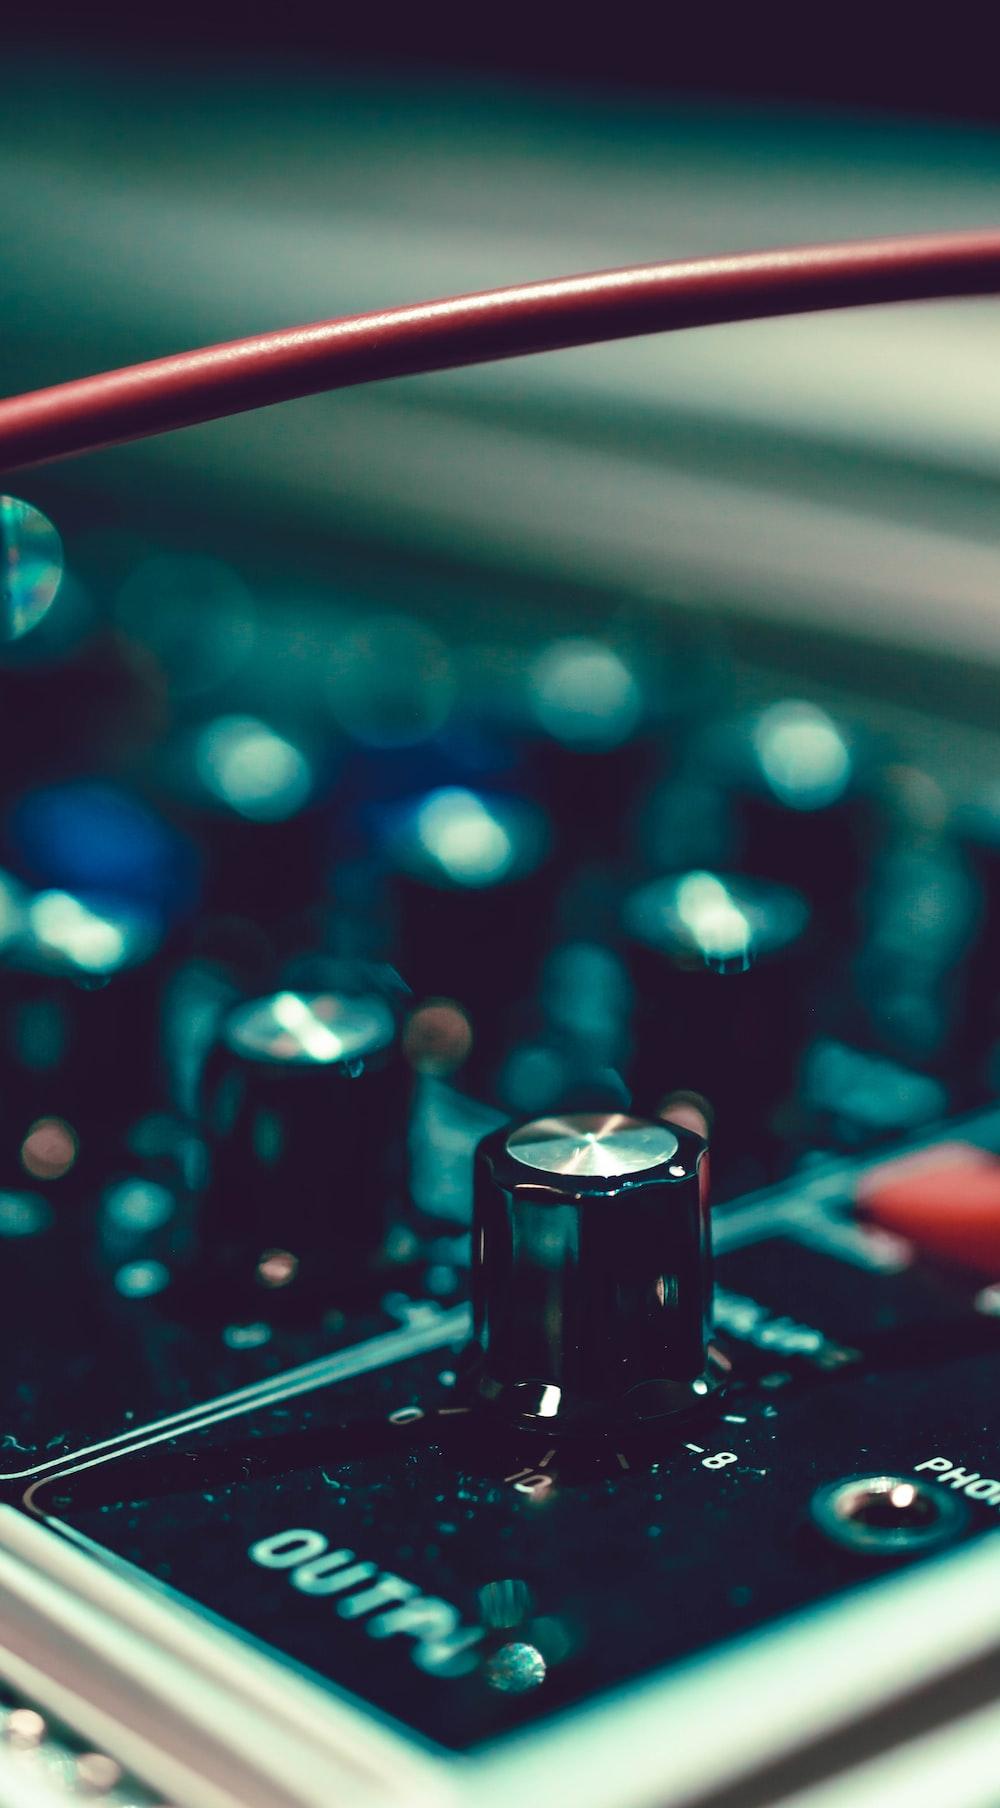 black and gray audio mixer close-up photo